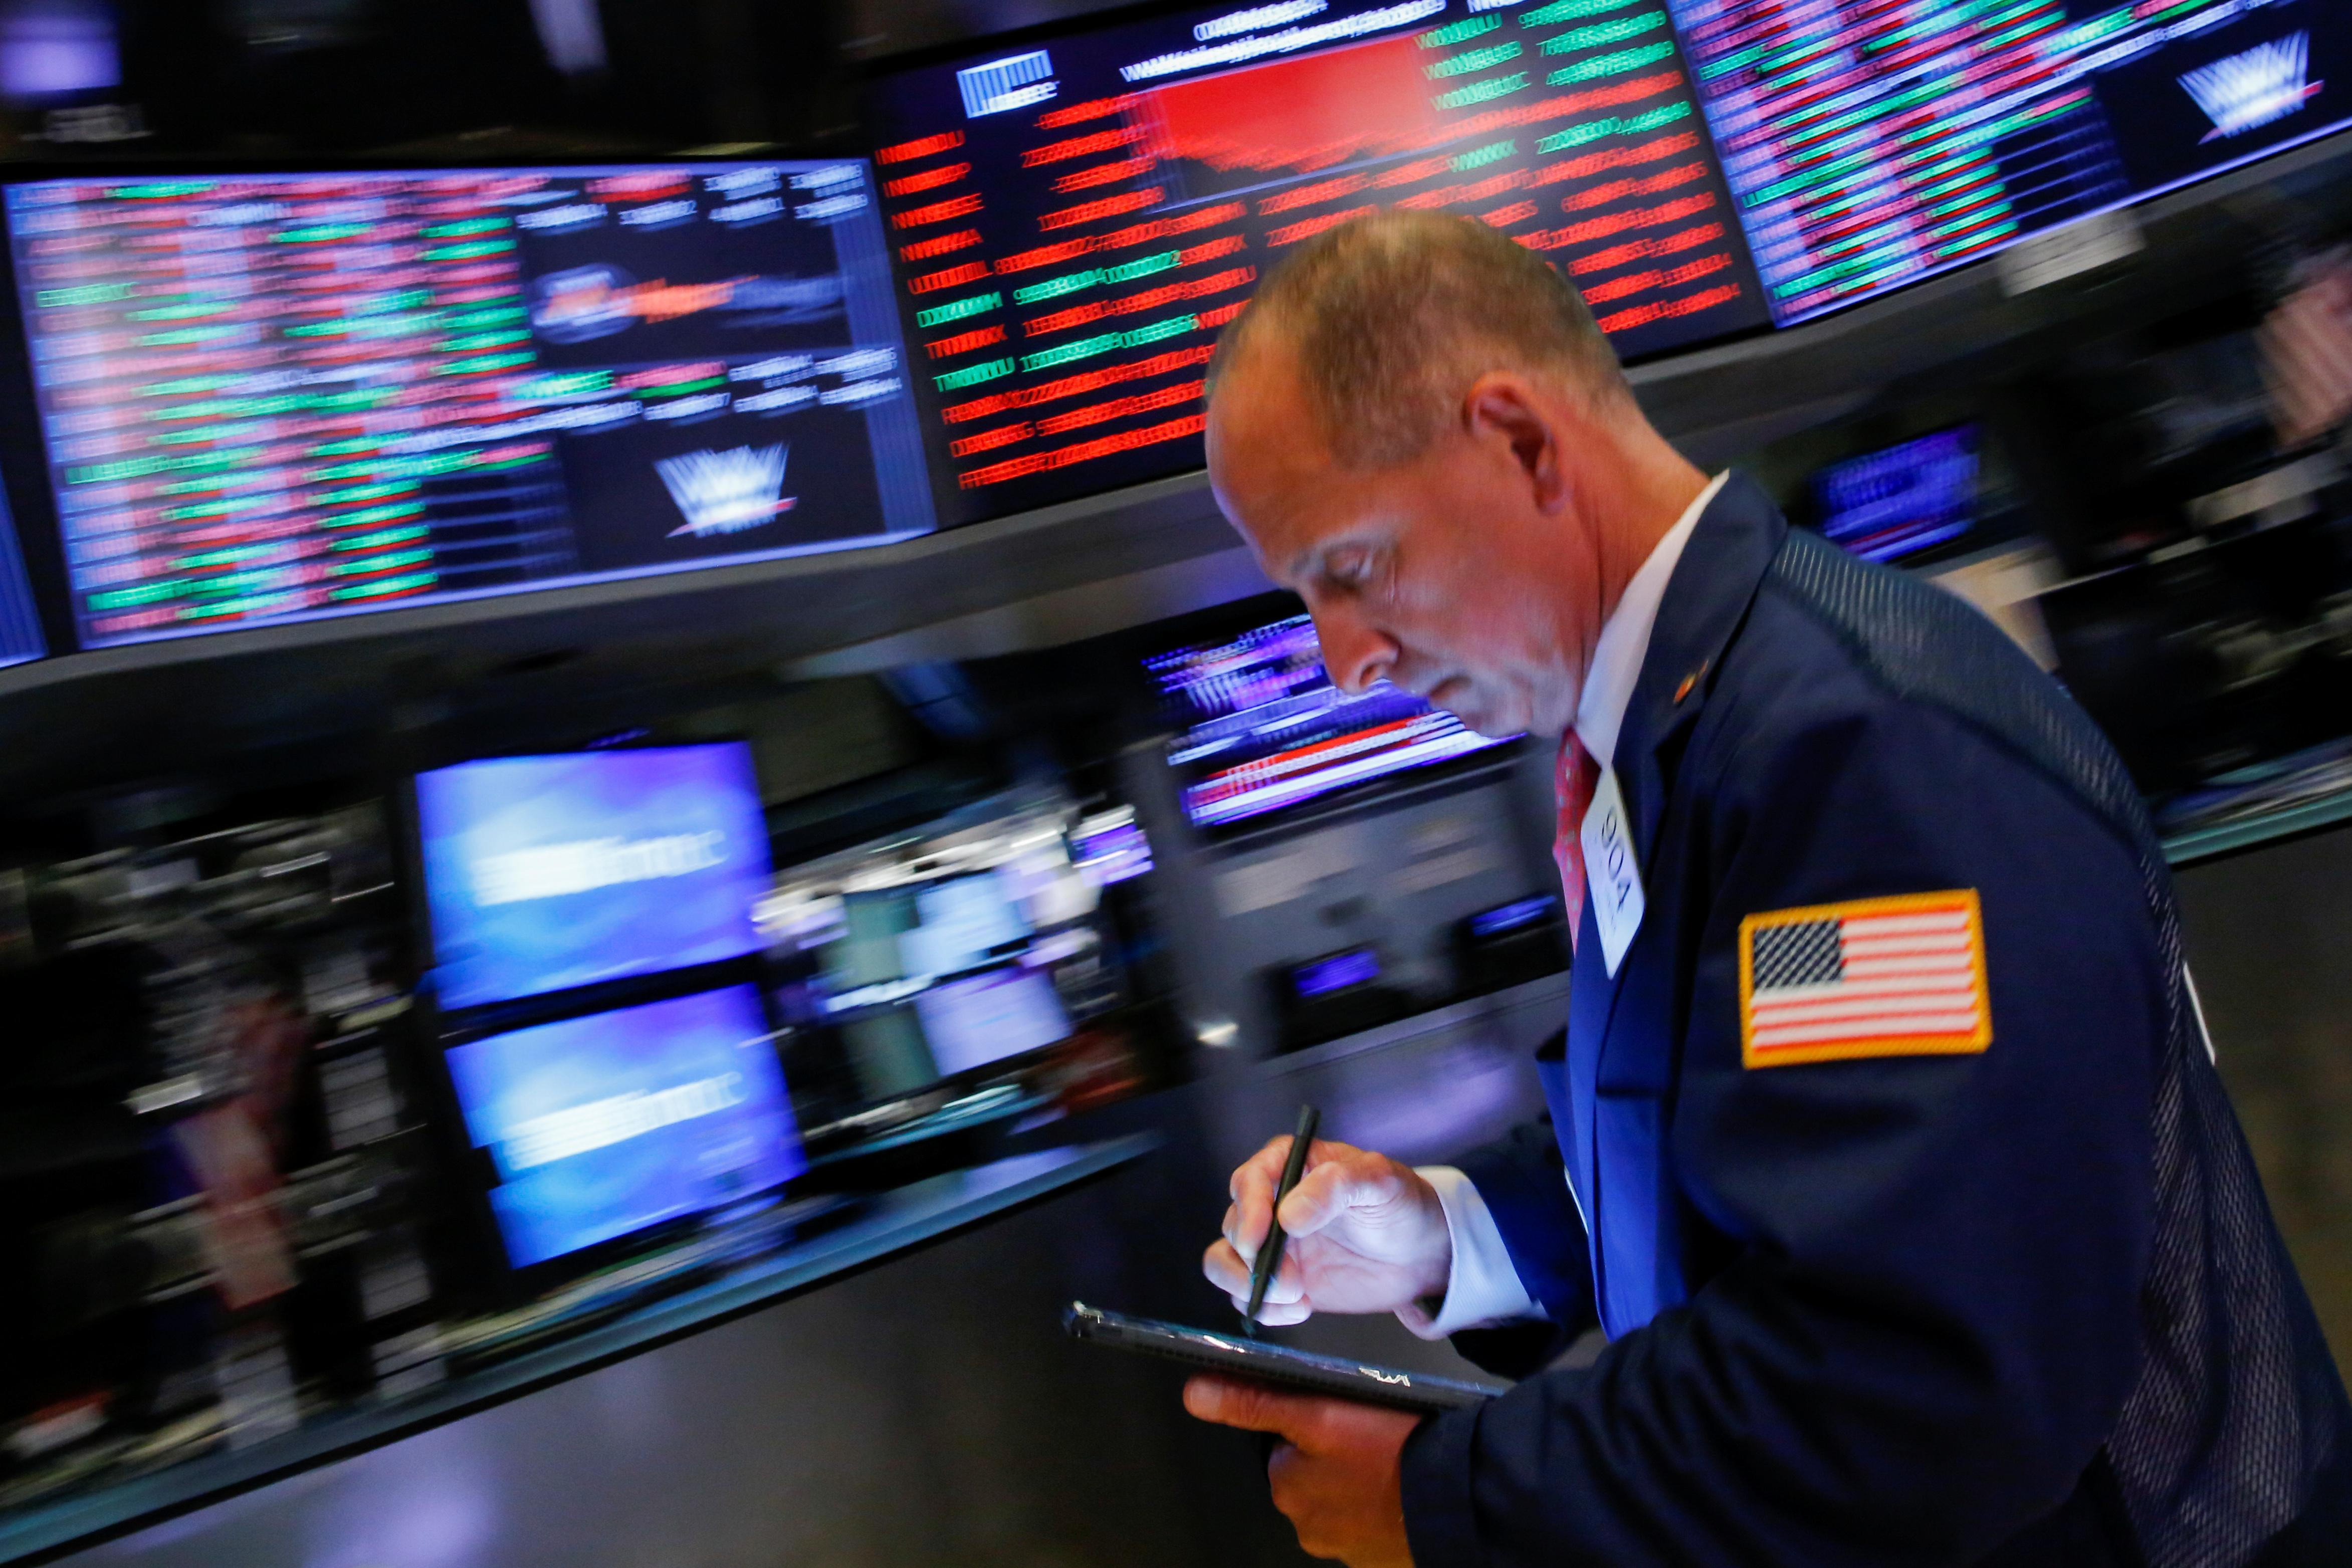 Stocks tumble, yen rallies as U.S. and China escalate trade war